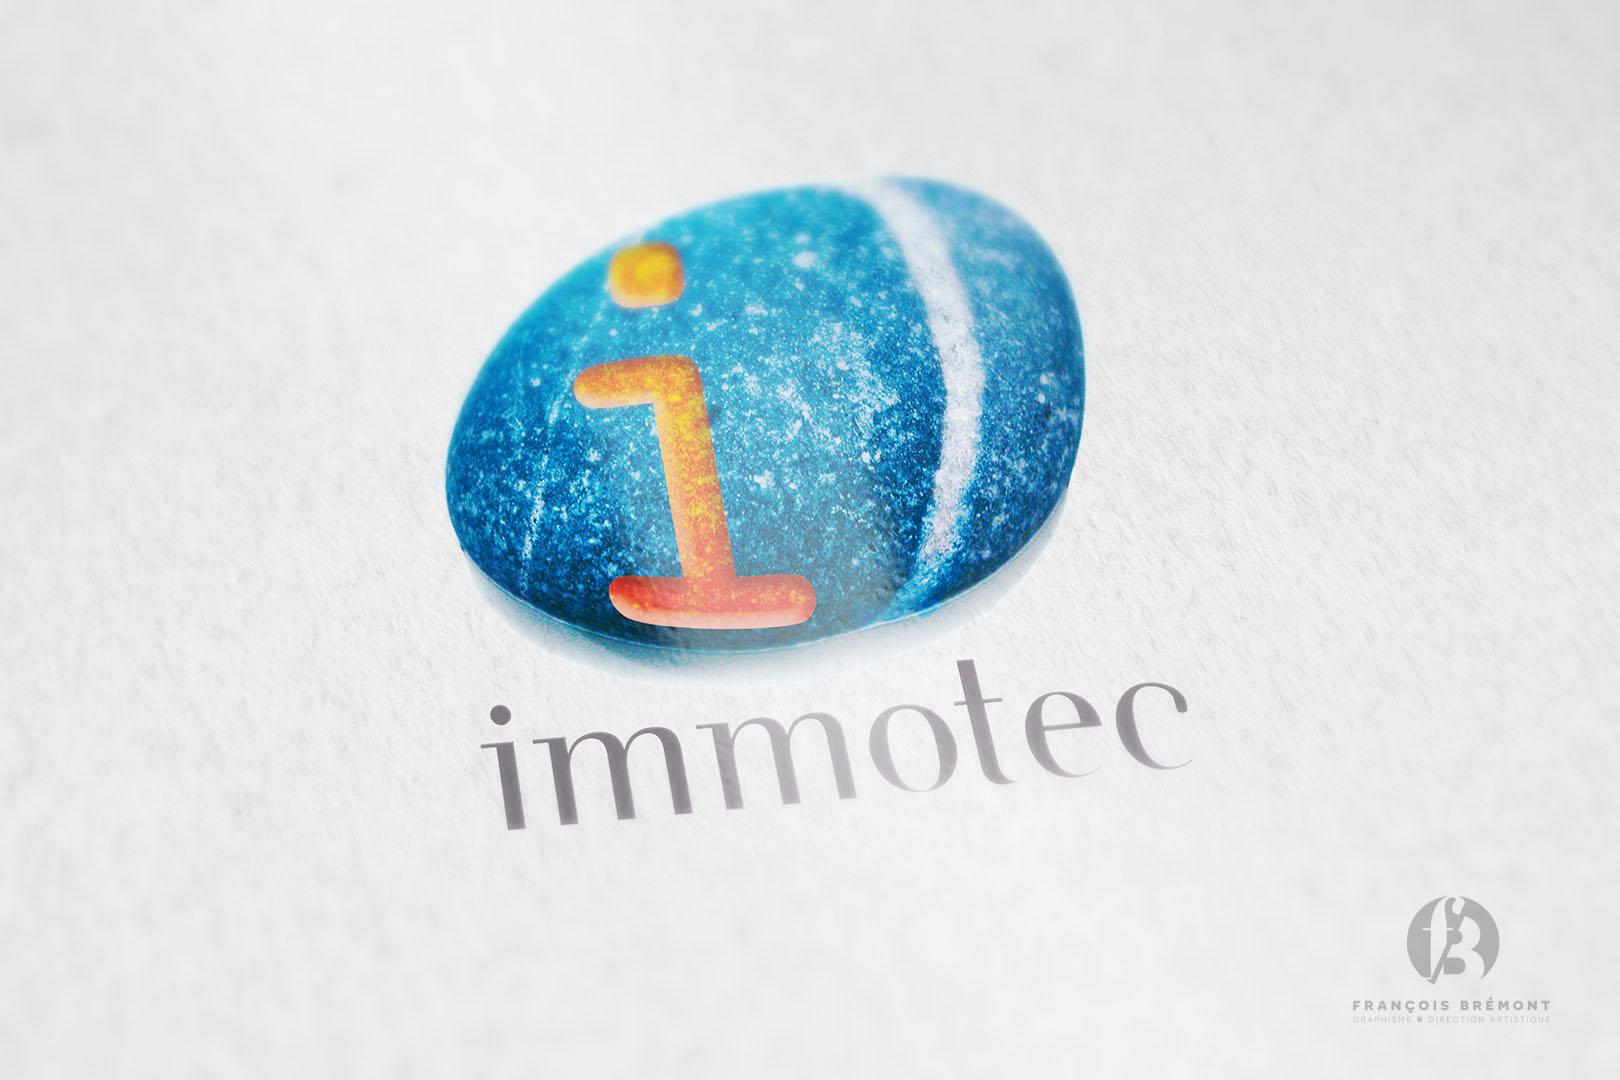 FilIDE_ImmotecLgomockup